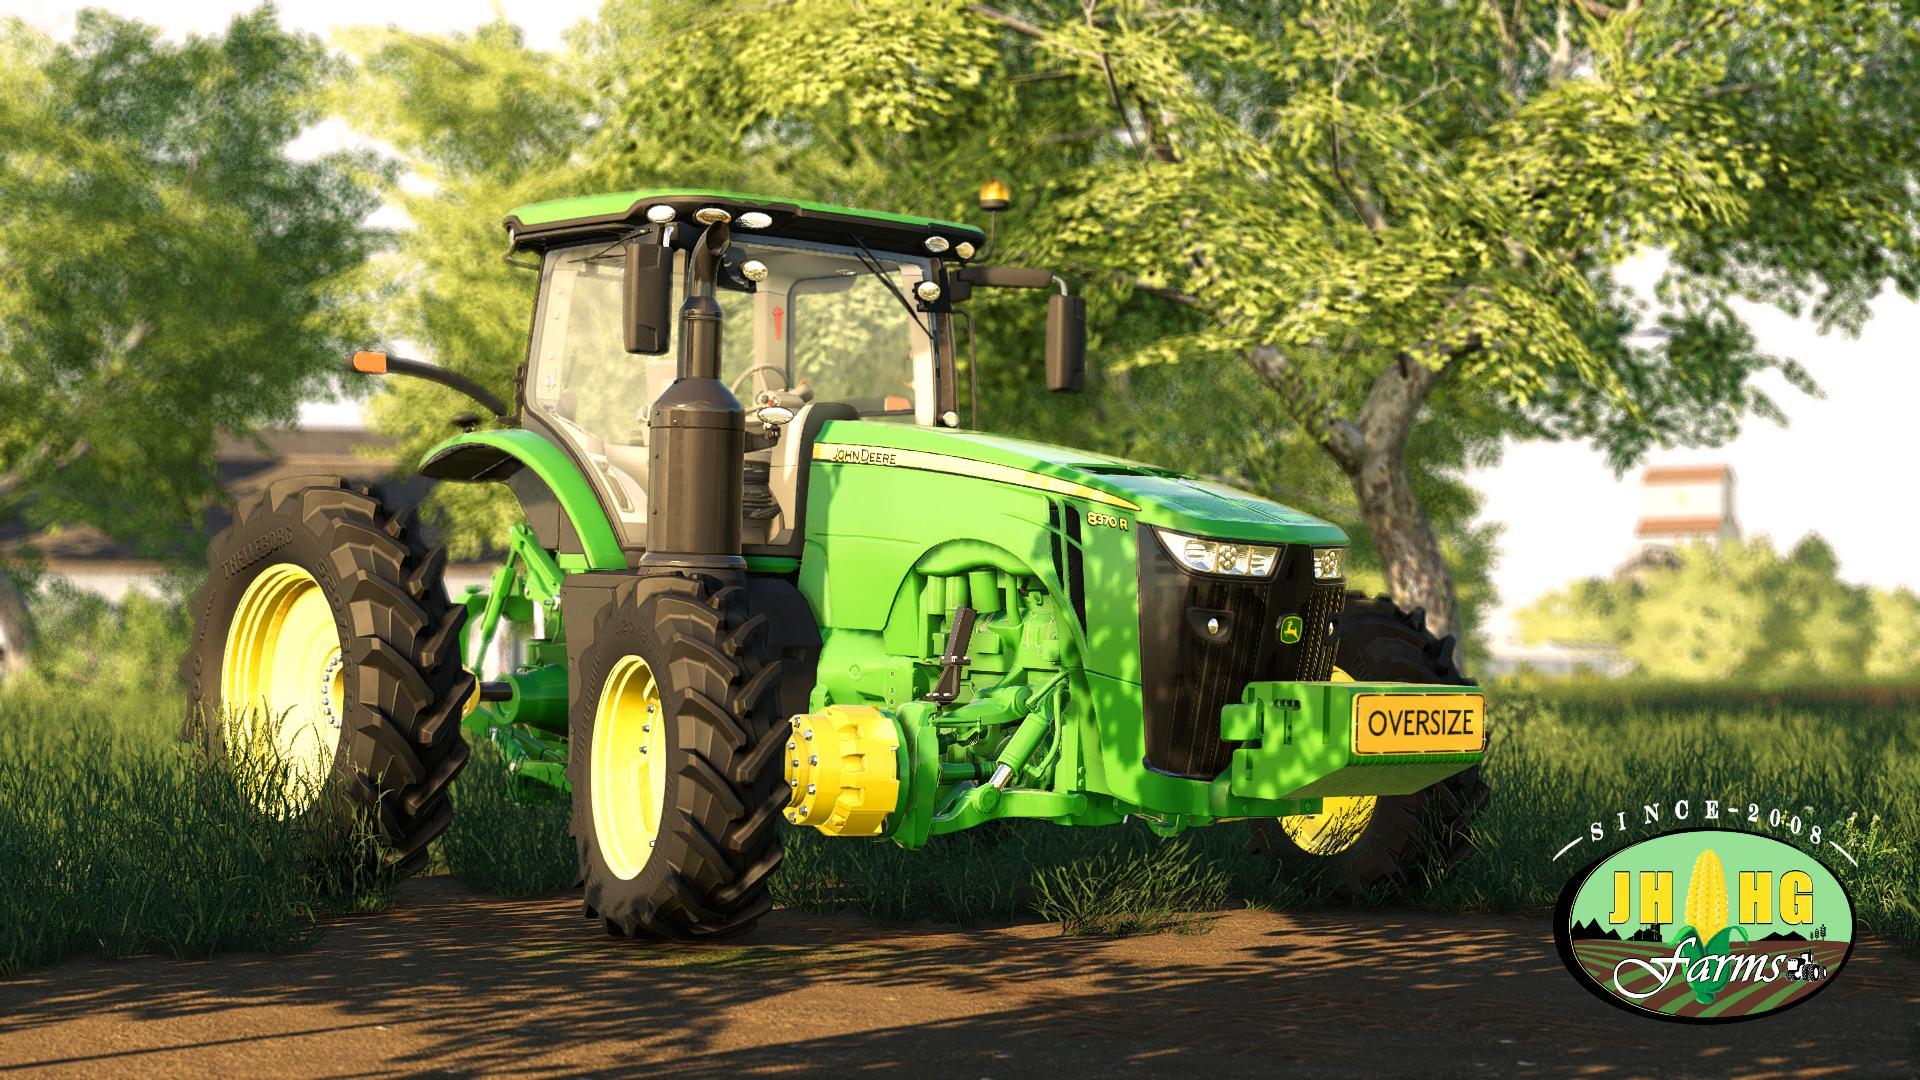 John Deere 8R US Series 2018 v3 1 FS19 - Farming Simulator 19 Mod